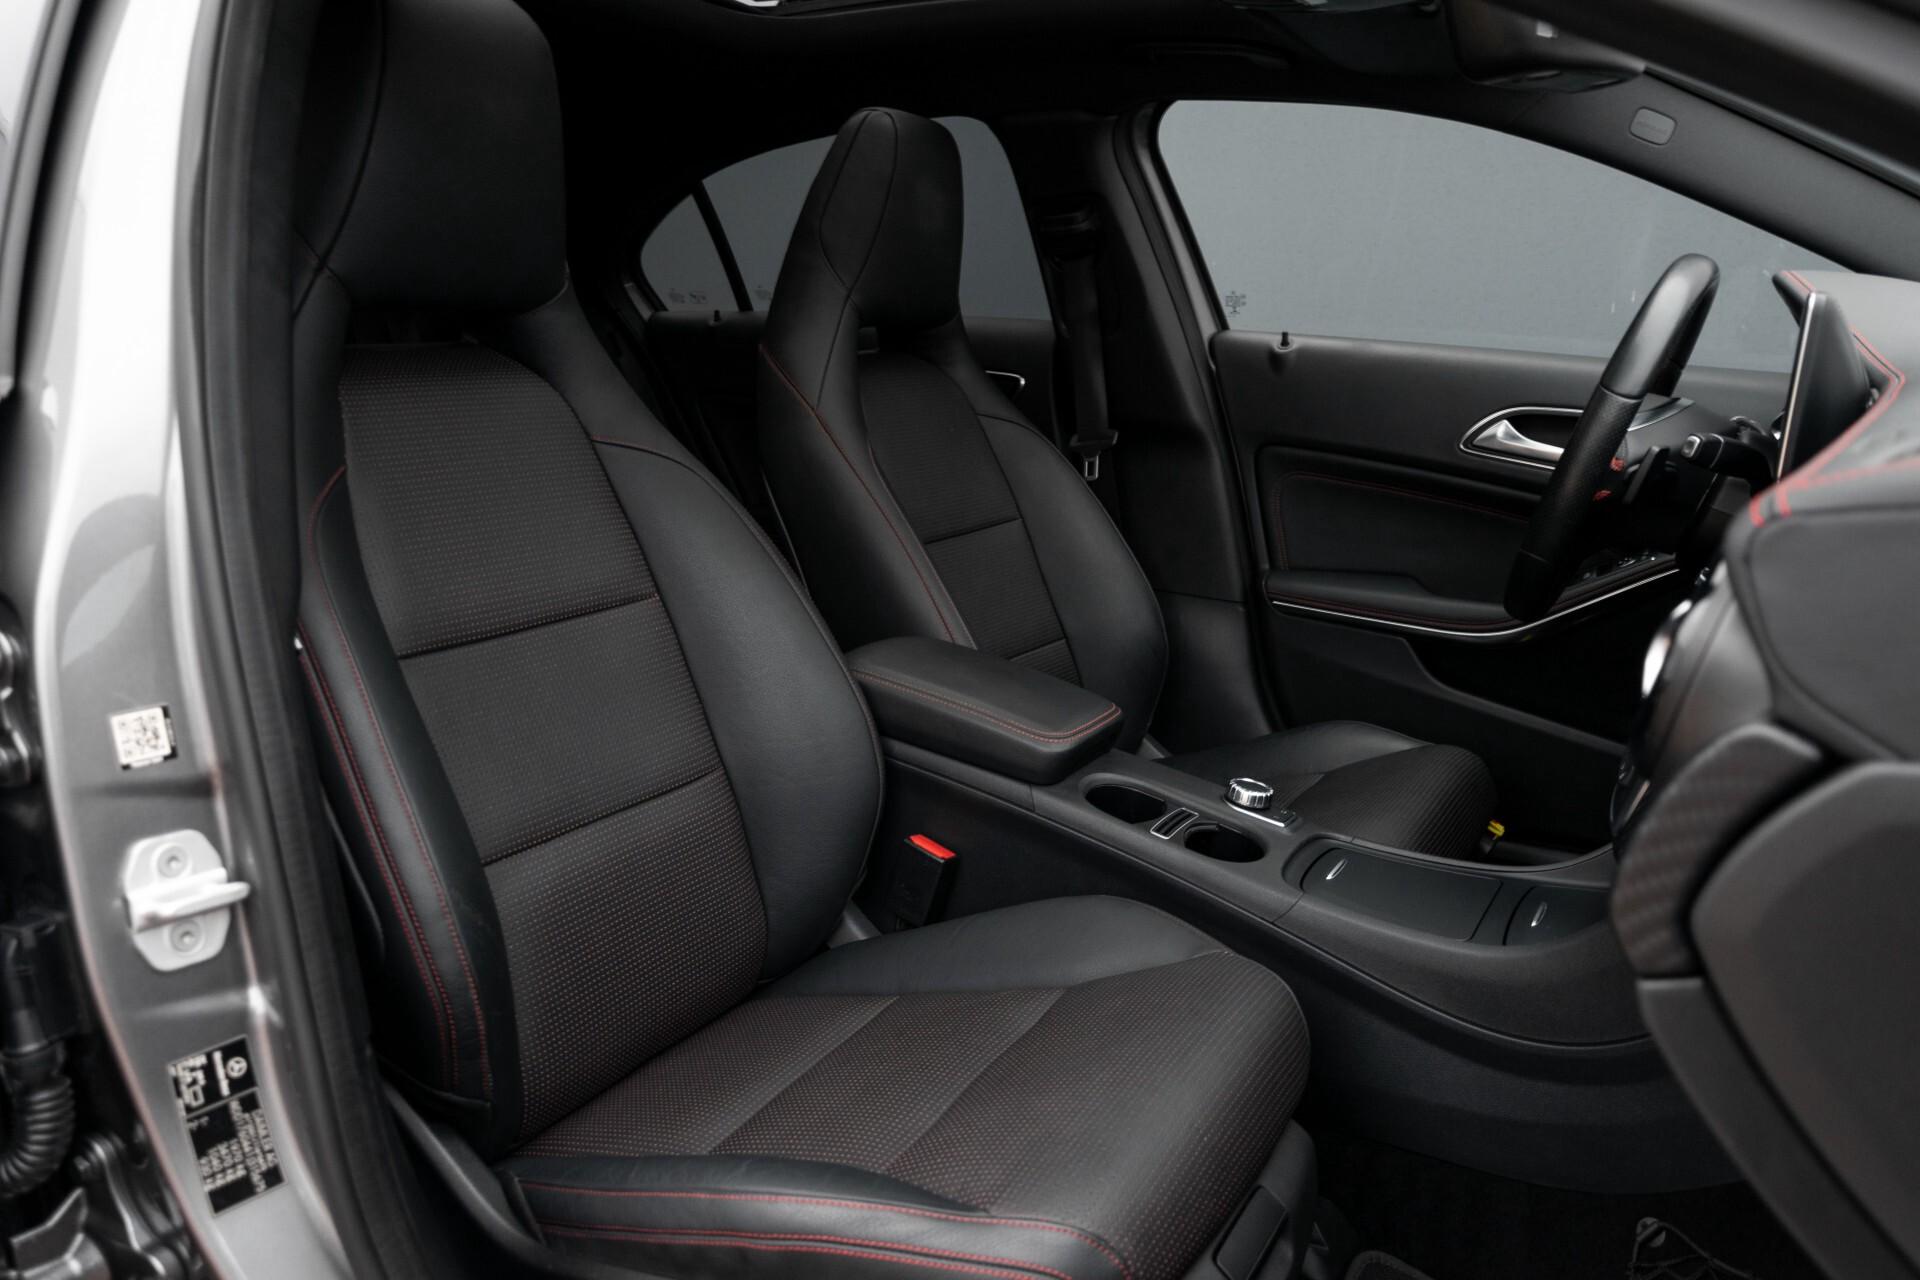 Mercedes-Benz A-Klasse 250 Sport AMG Panorama/Standkachel/Mem/Harman-Kardon/Distronic/Camera/Com Aut7 Foto 4